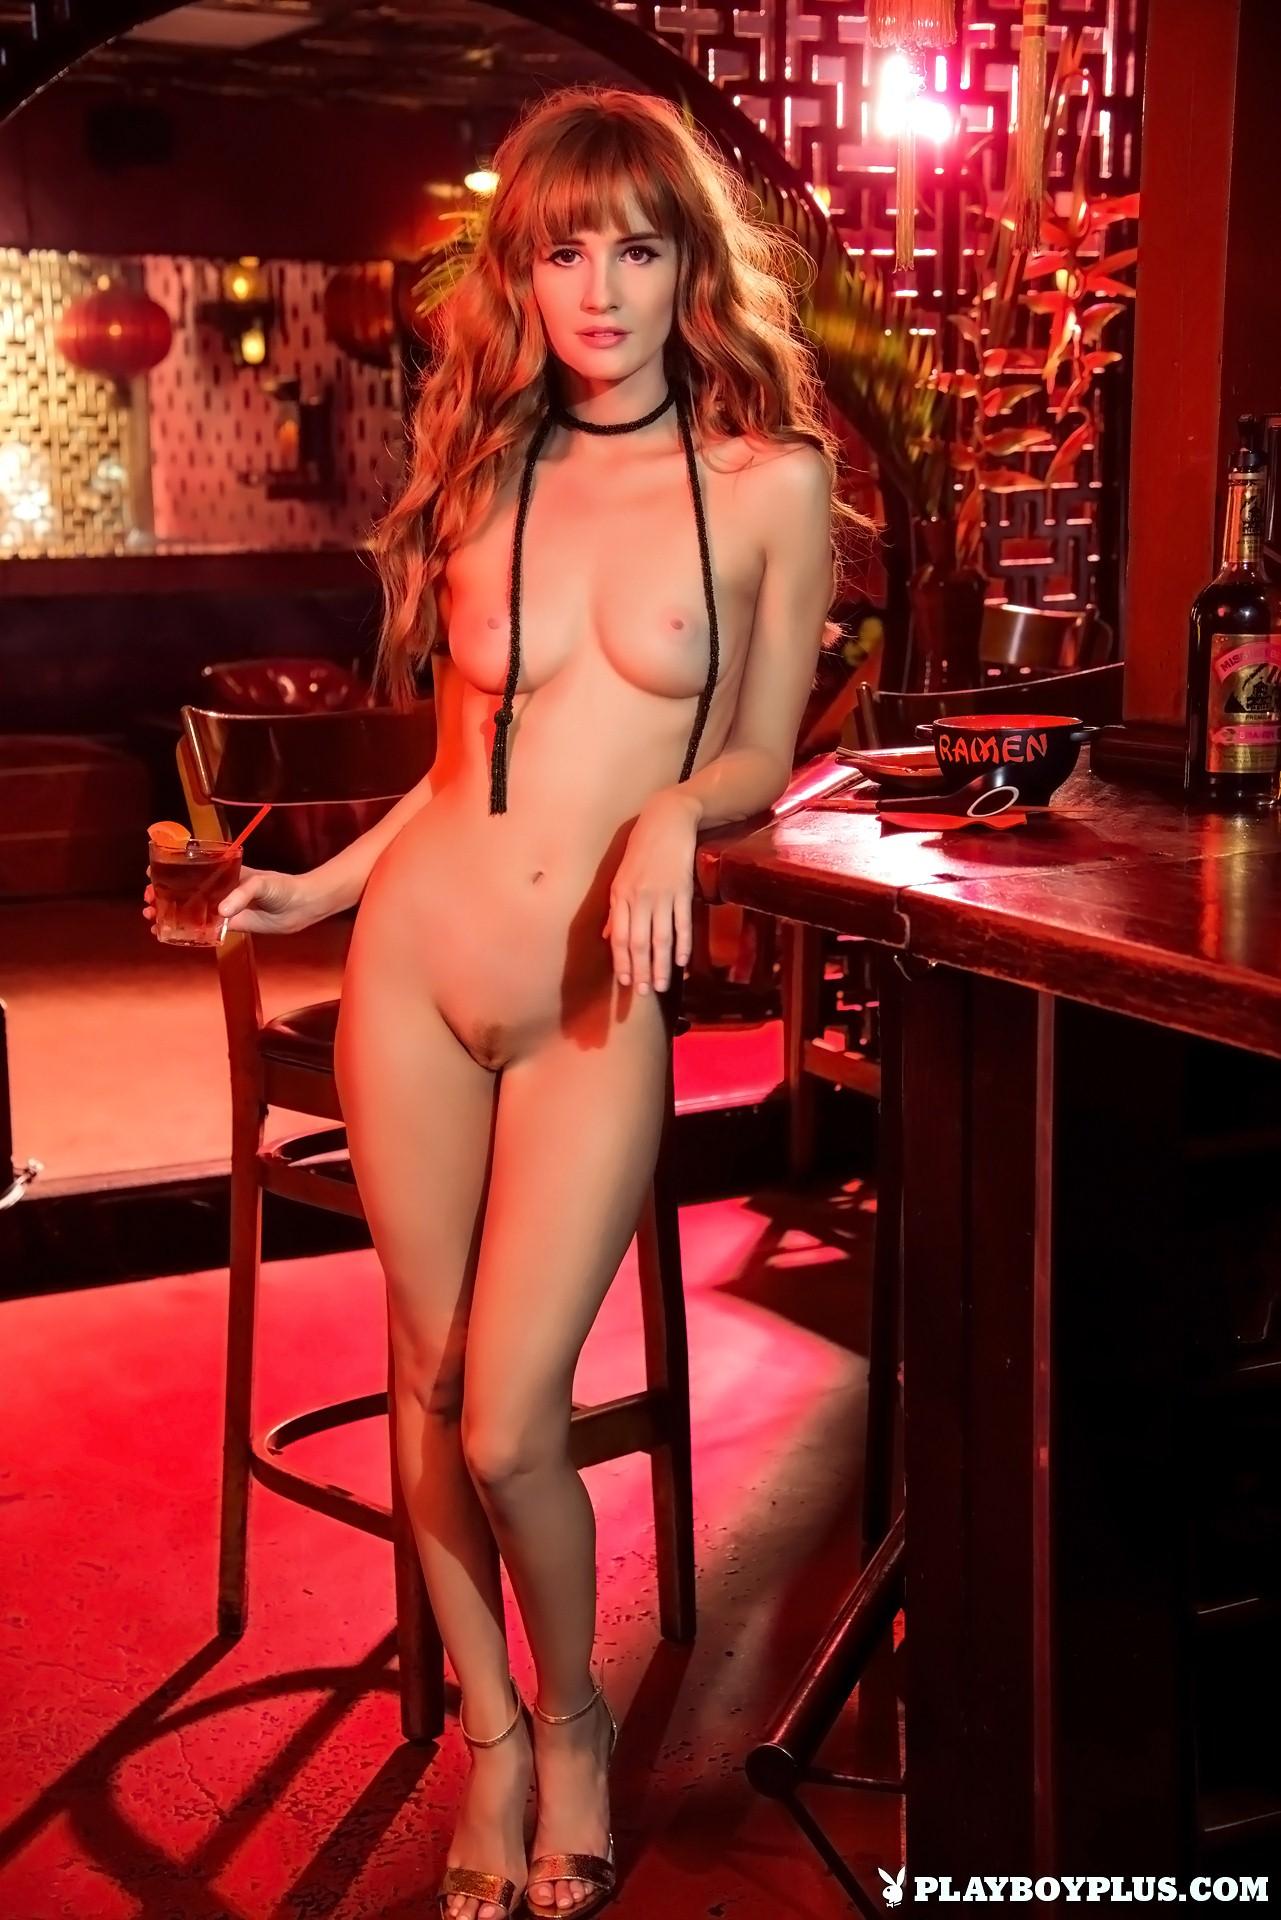 dominique jane nude